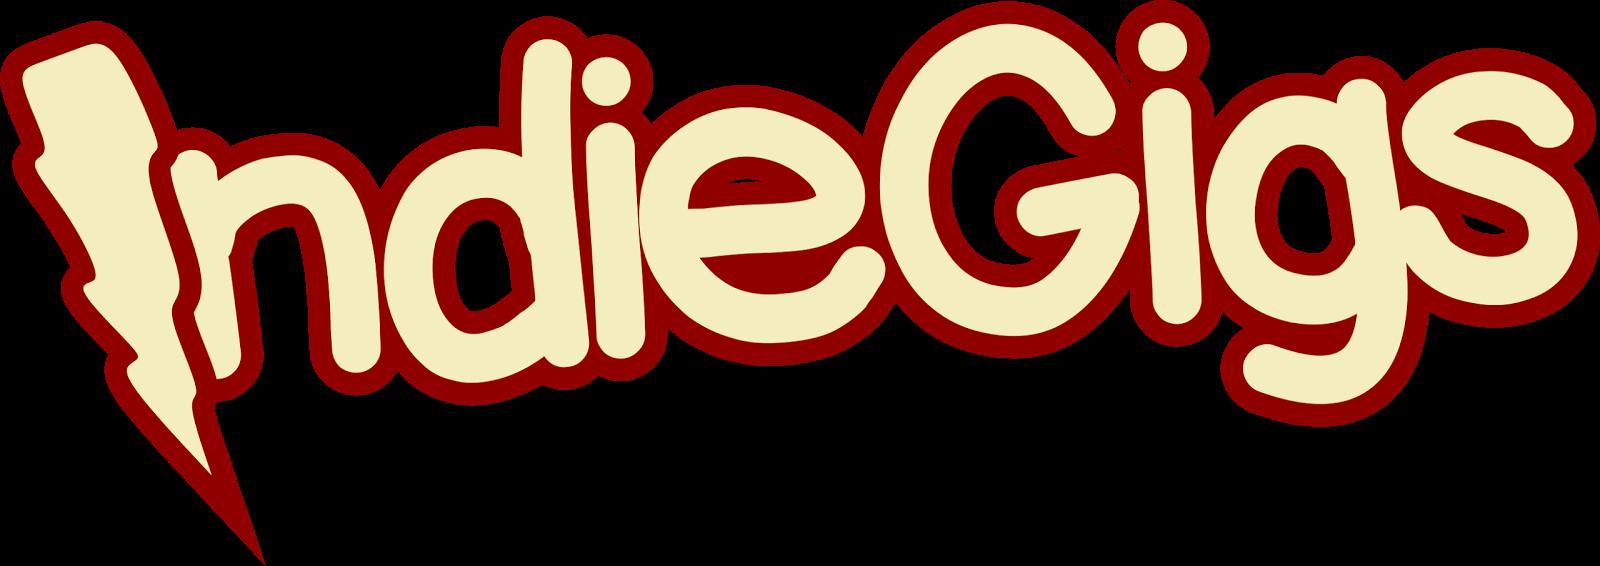 INDIEGIGSMEDIA.COM